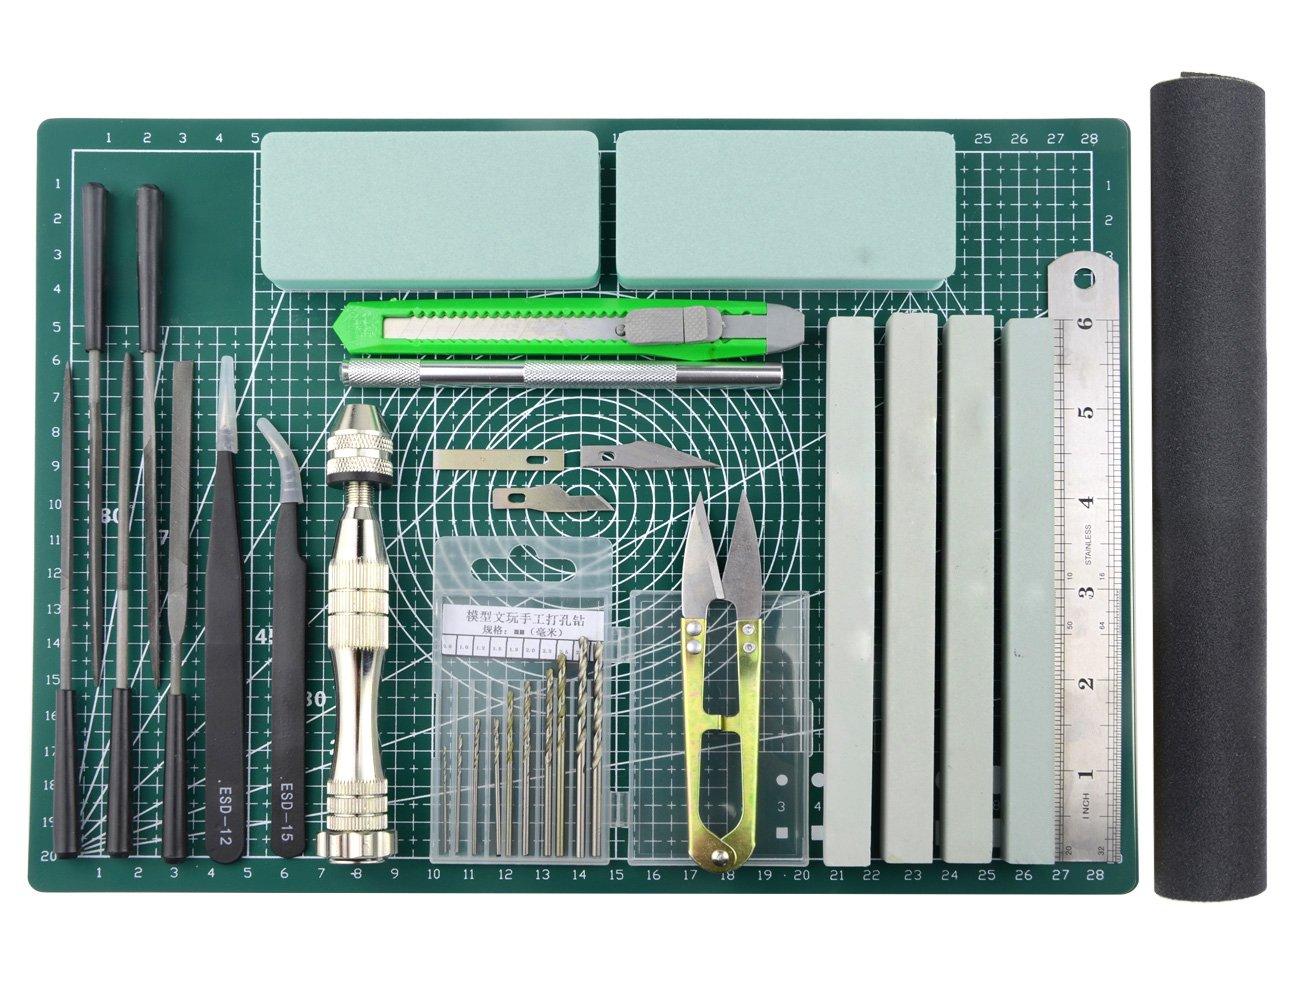 Modeler Basic Tools Craft Set for Gundam Car Model Building